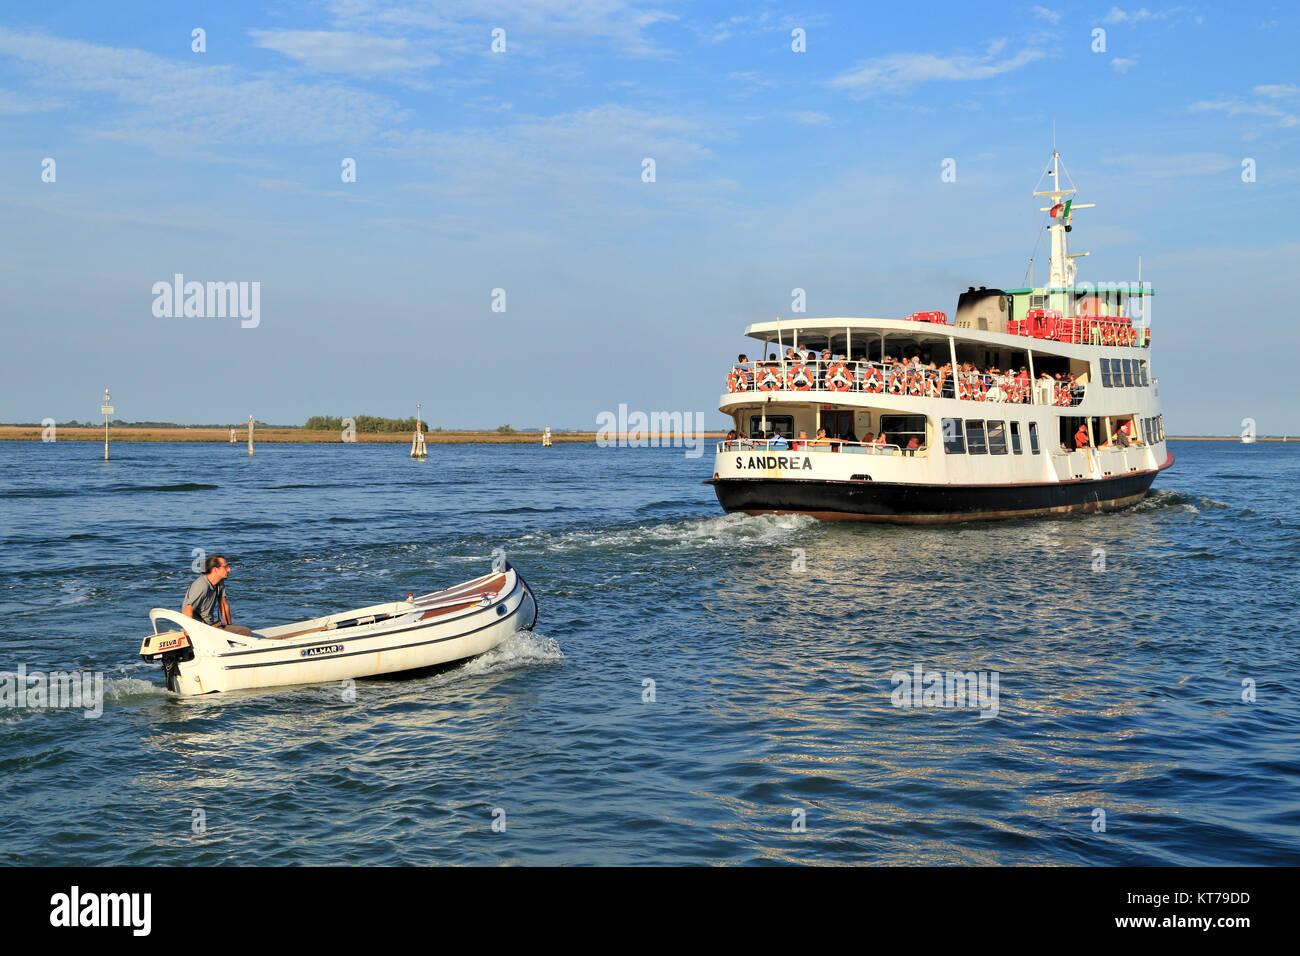 Venetian Lagoon, S.ANDREA vaporetto ferry line ship - Stock Image